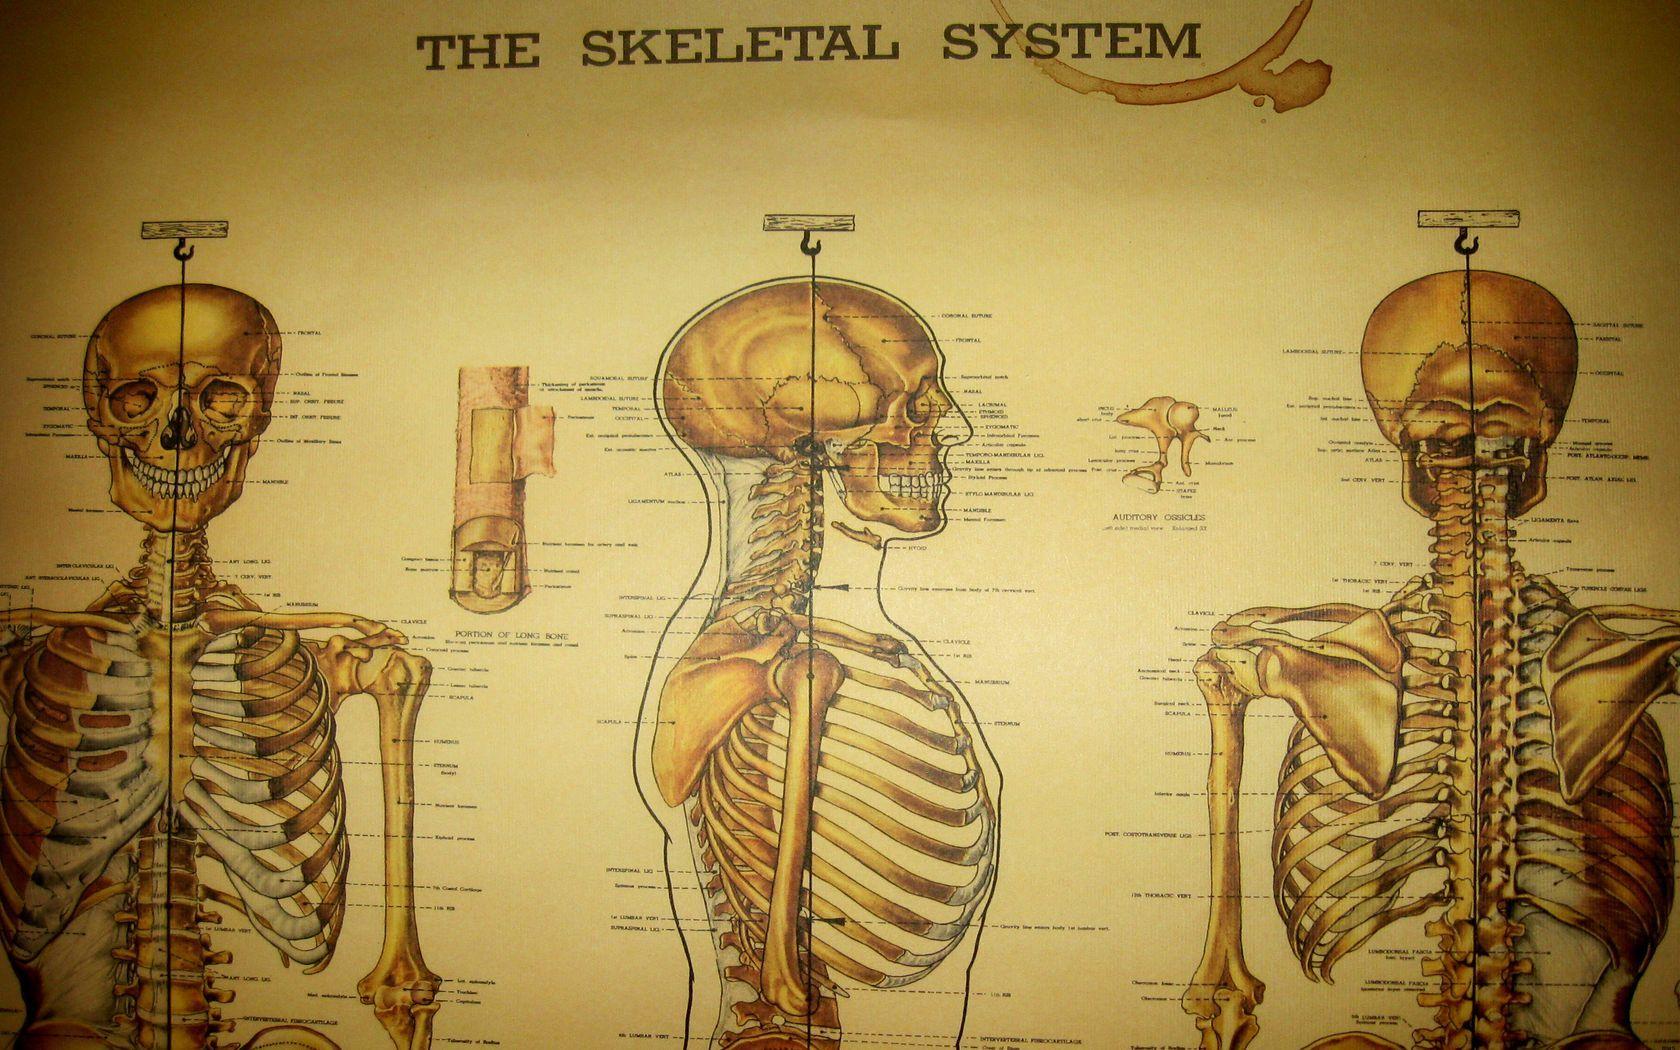 Teahub.io Medical Wallpaper 203451, بنیاد فرهنگ تغذیه | حکیم رضی